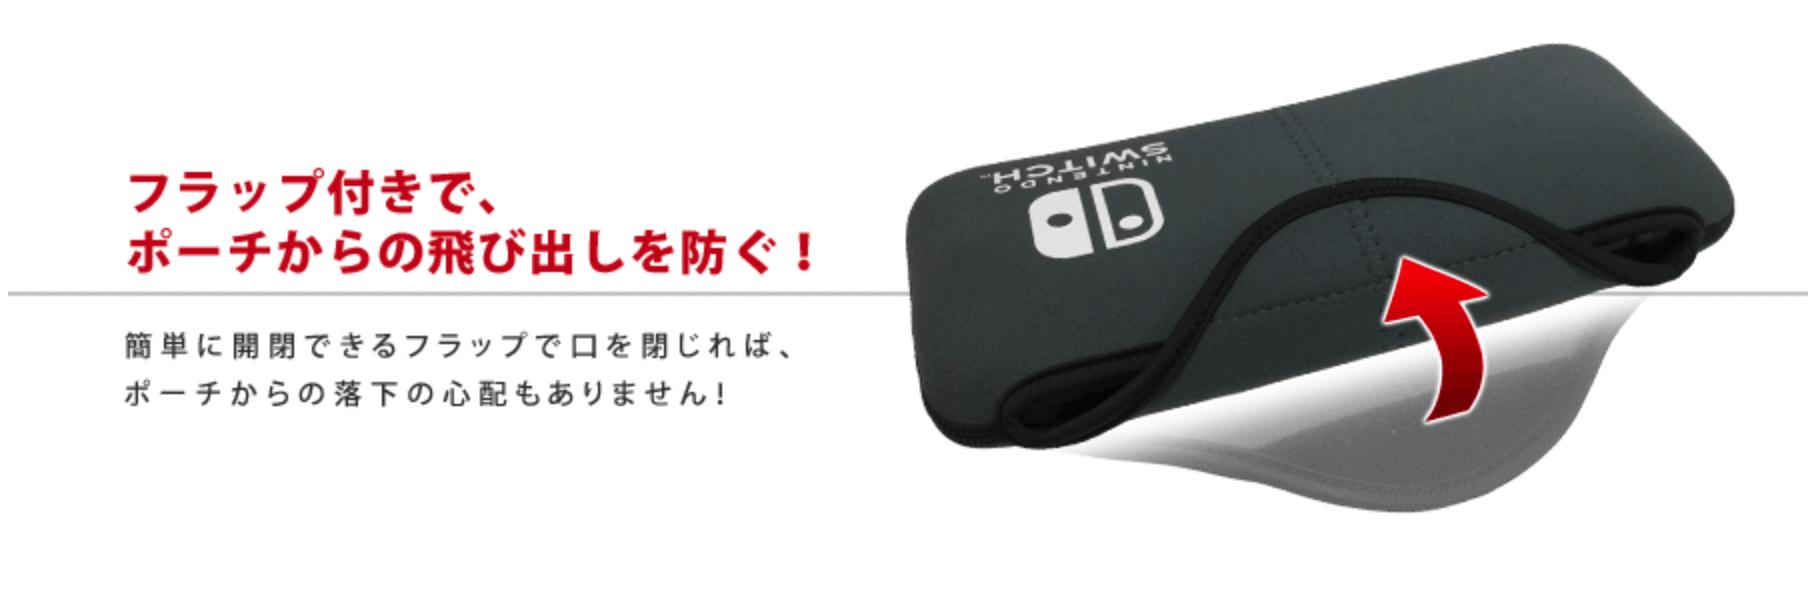 Nintendo switch専用ケースポーチ|QUICK POUCHケースからの落下防止